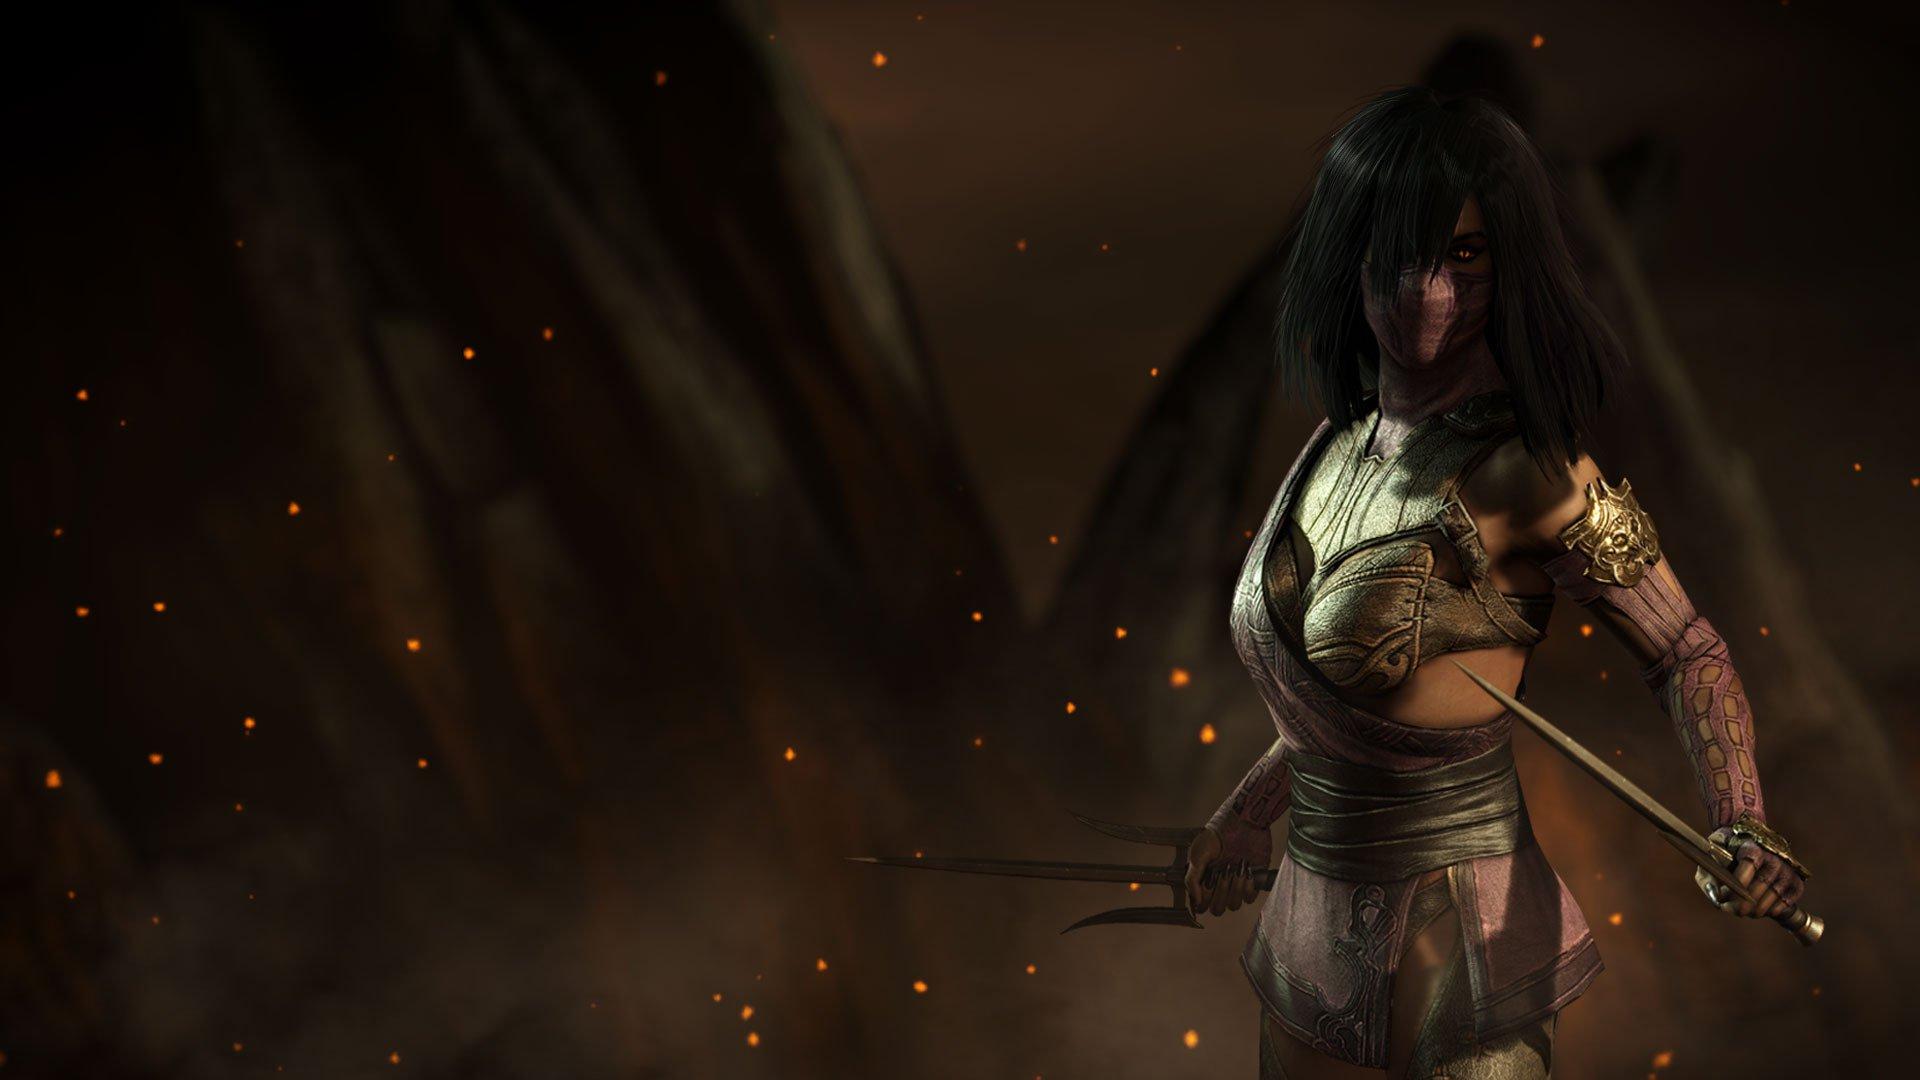 Mortal Kombat X Wallpapers de todos los personajes   Taringa 1920x1080